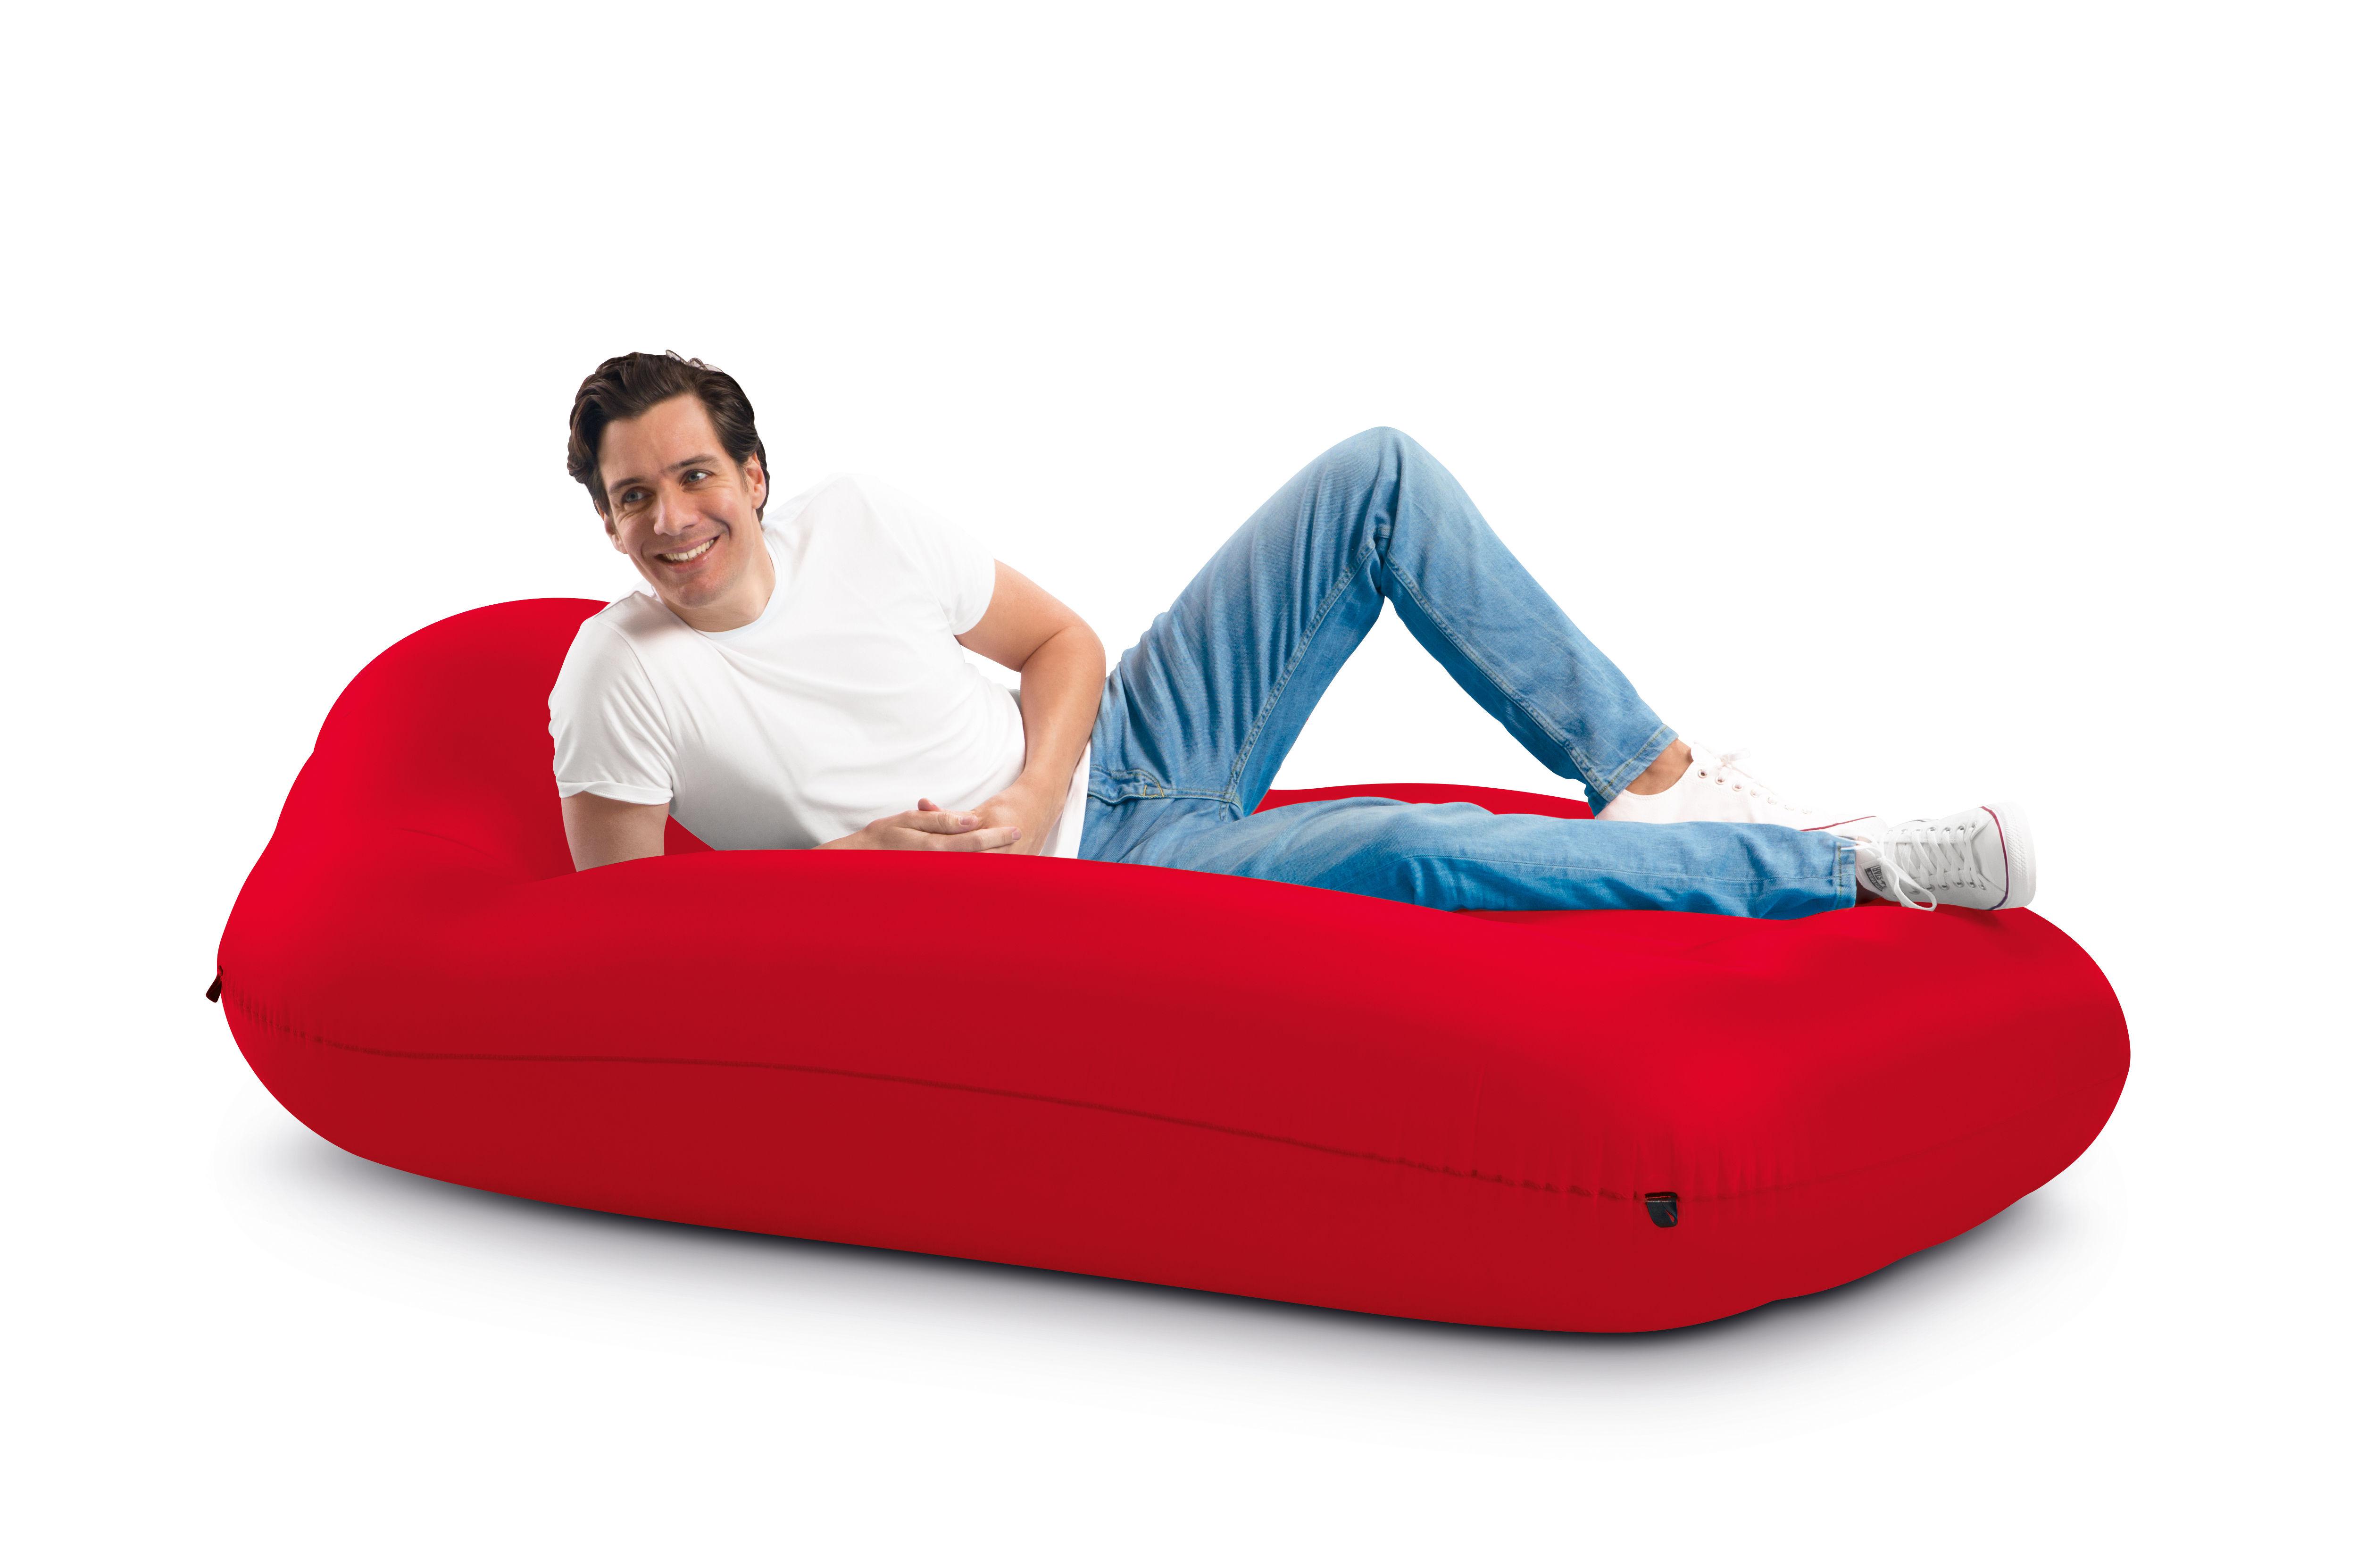 Furniture - Poufs & Floor Cushions - Lamzac L Air mattress - / L 195 x W 112 cm by Fatboy - Red - Nylon